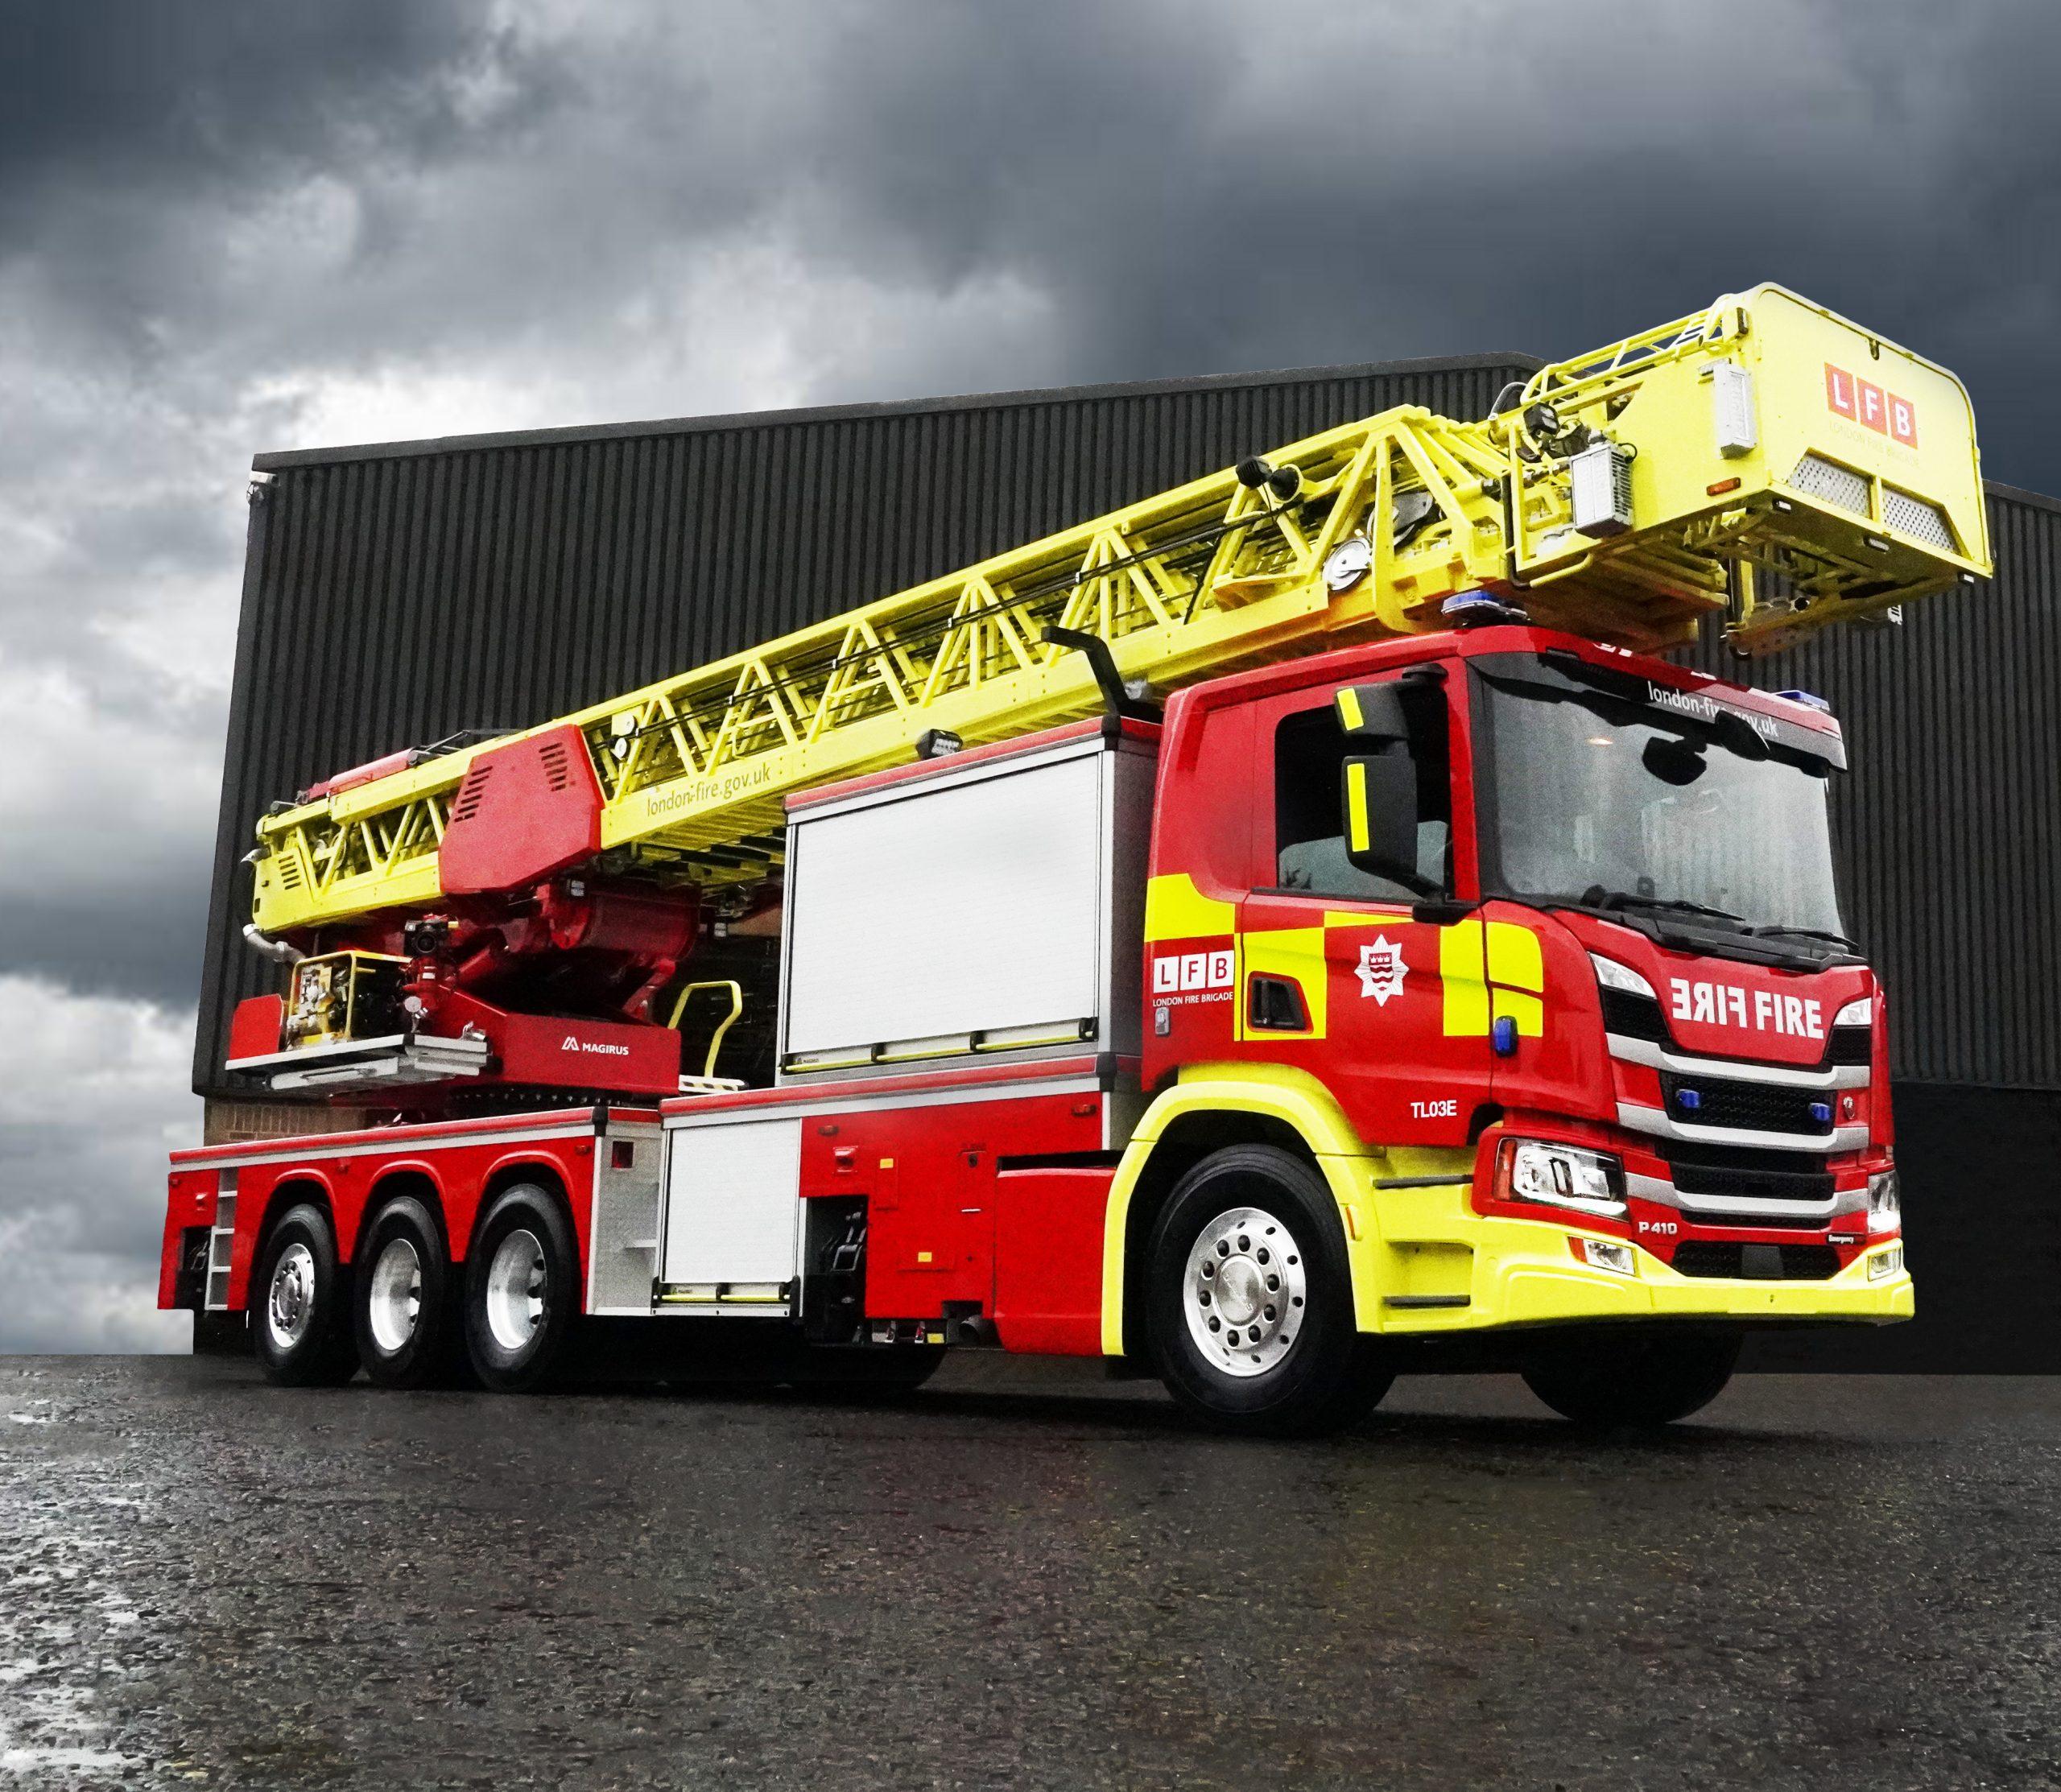 Emergency One Fire Engine, Magirus TTL, 64m, LFB, manufacturer